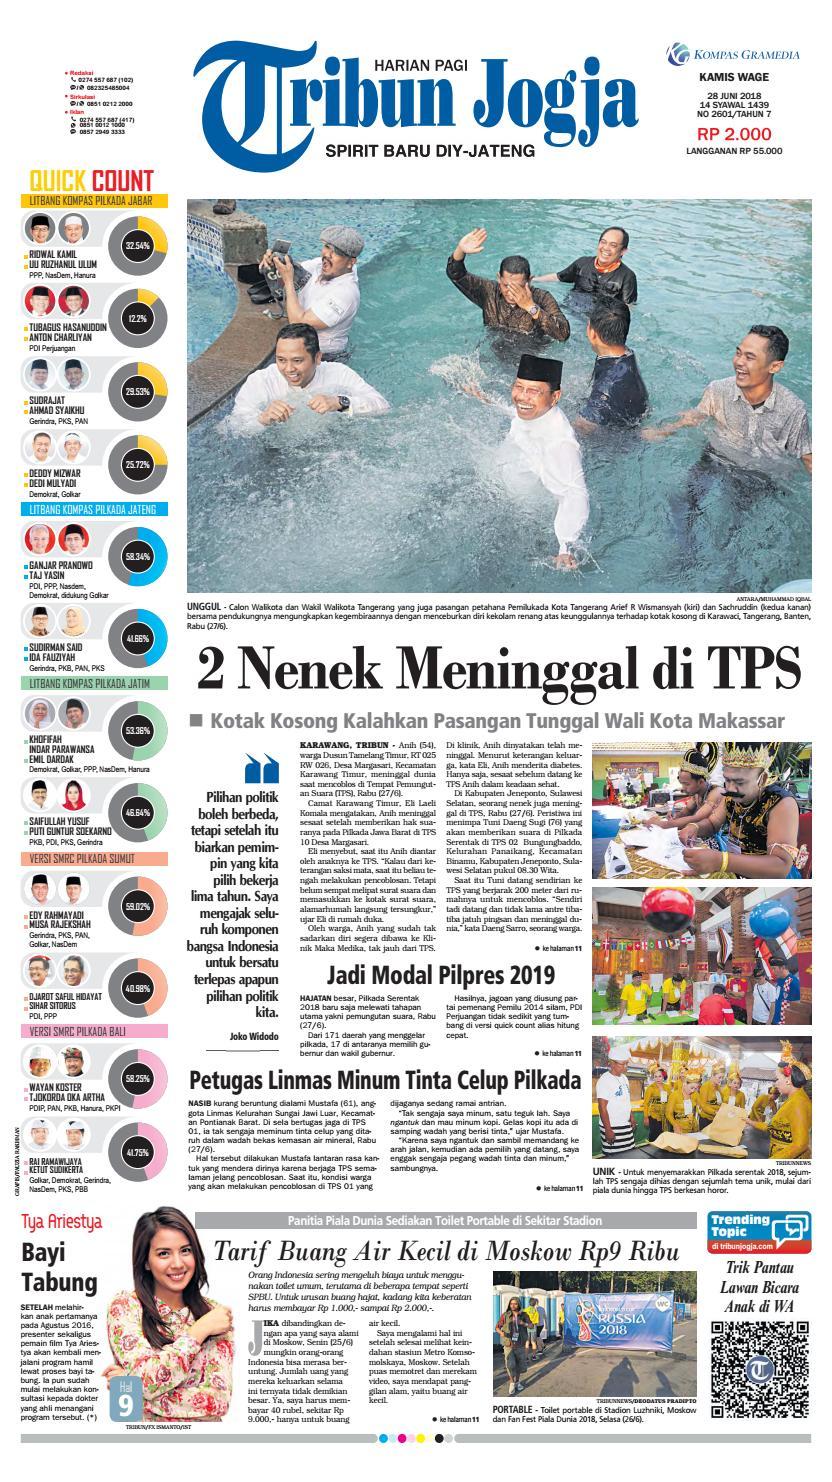 Tribunjogja Edisi 28 06 2018 By Tribun Jogja Issuu